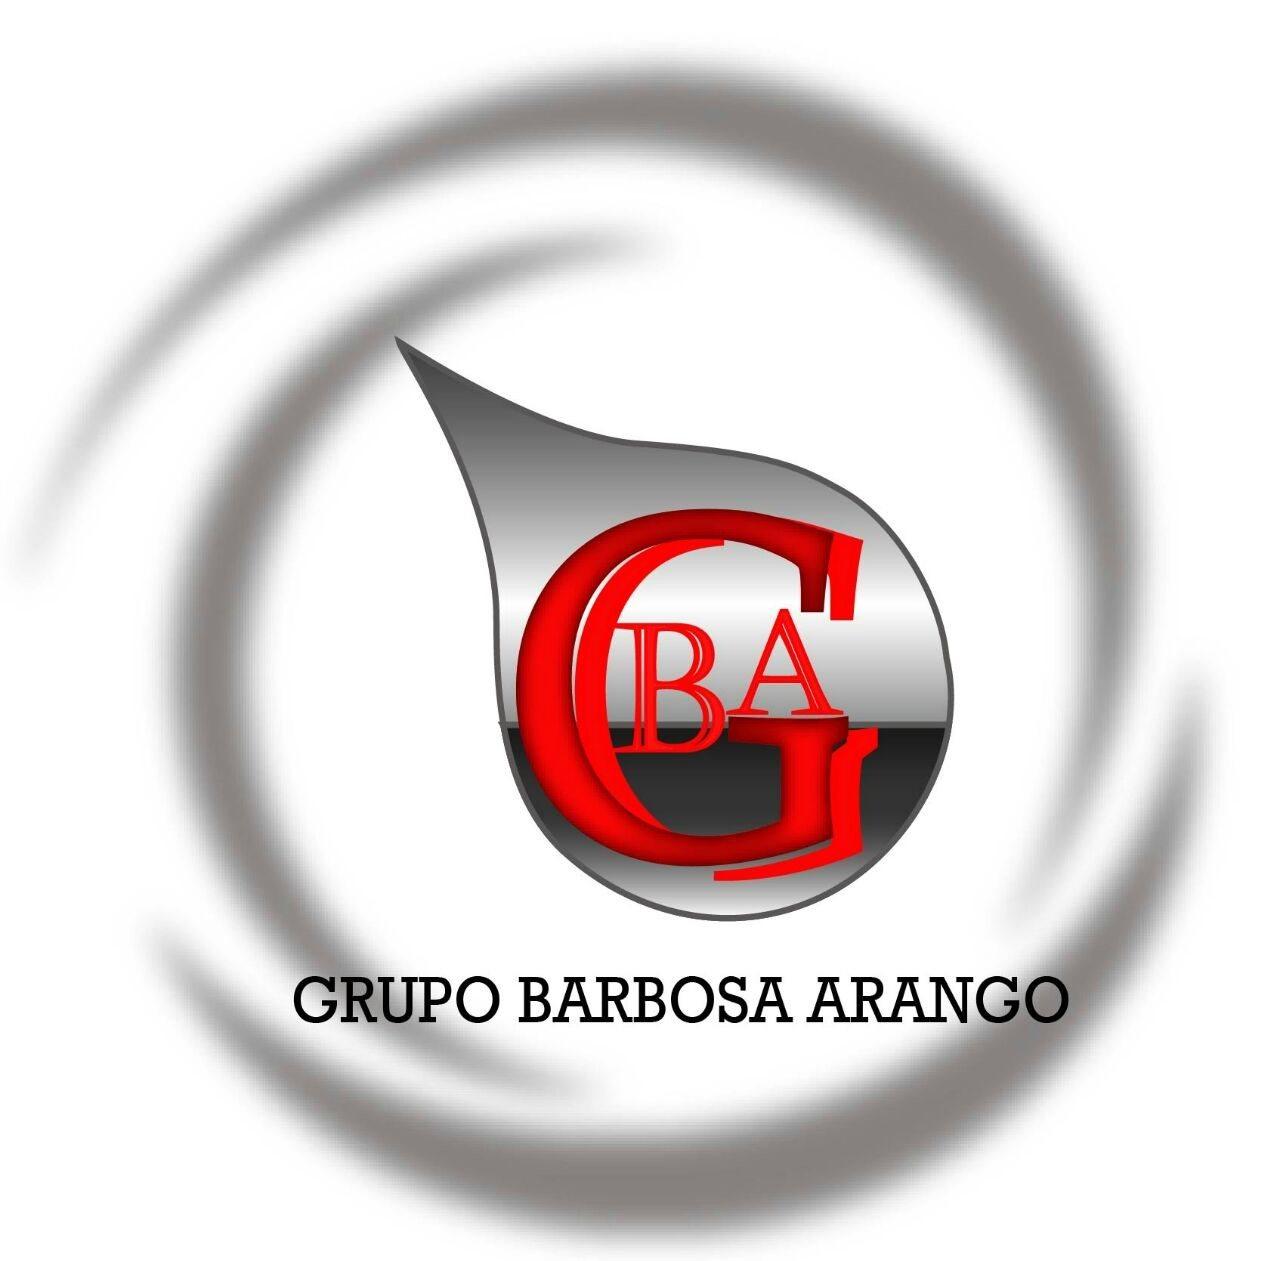 Grupo logístico nacional de transporte Barbosa Arango S.A.S